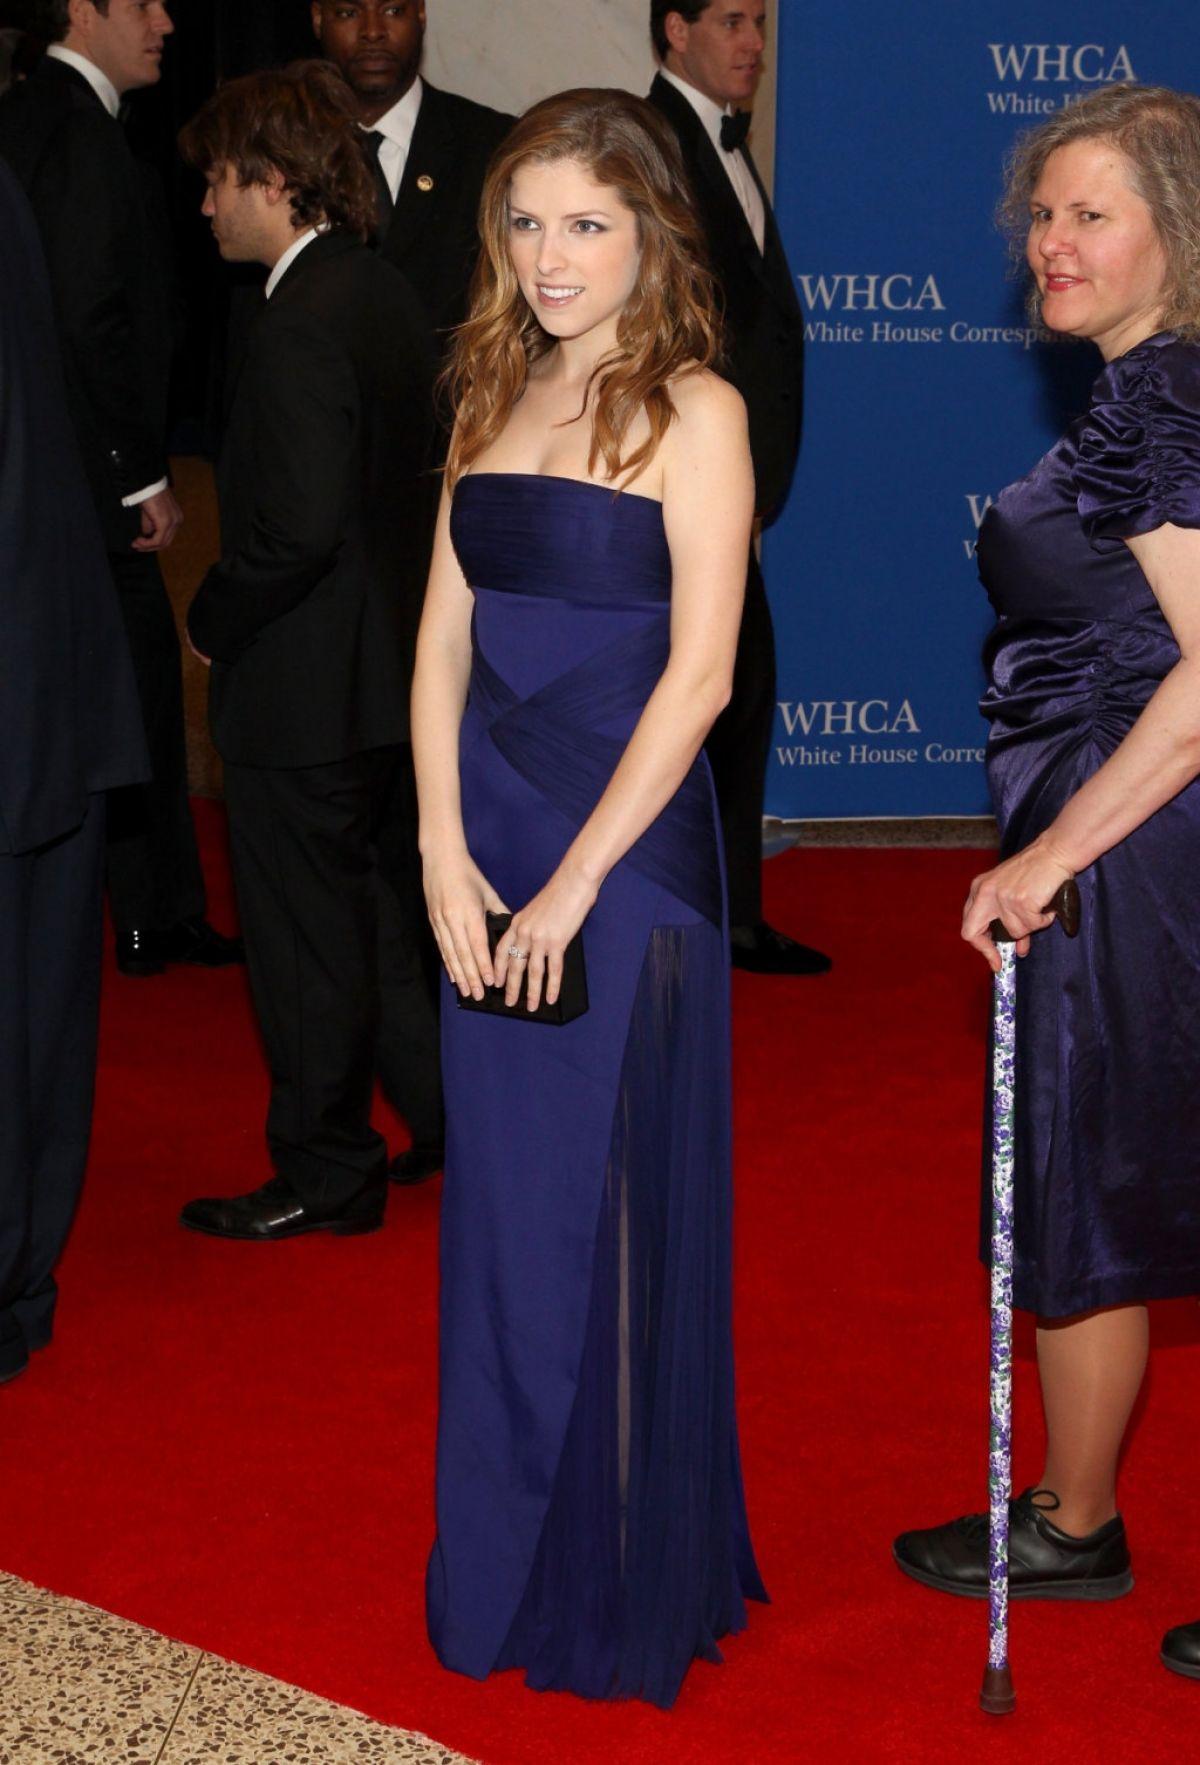 ANNA KENDRICK at White House Correspondents Association Dinner 2014 in Washington